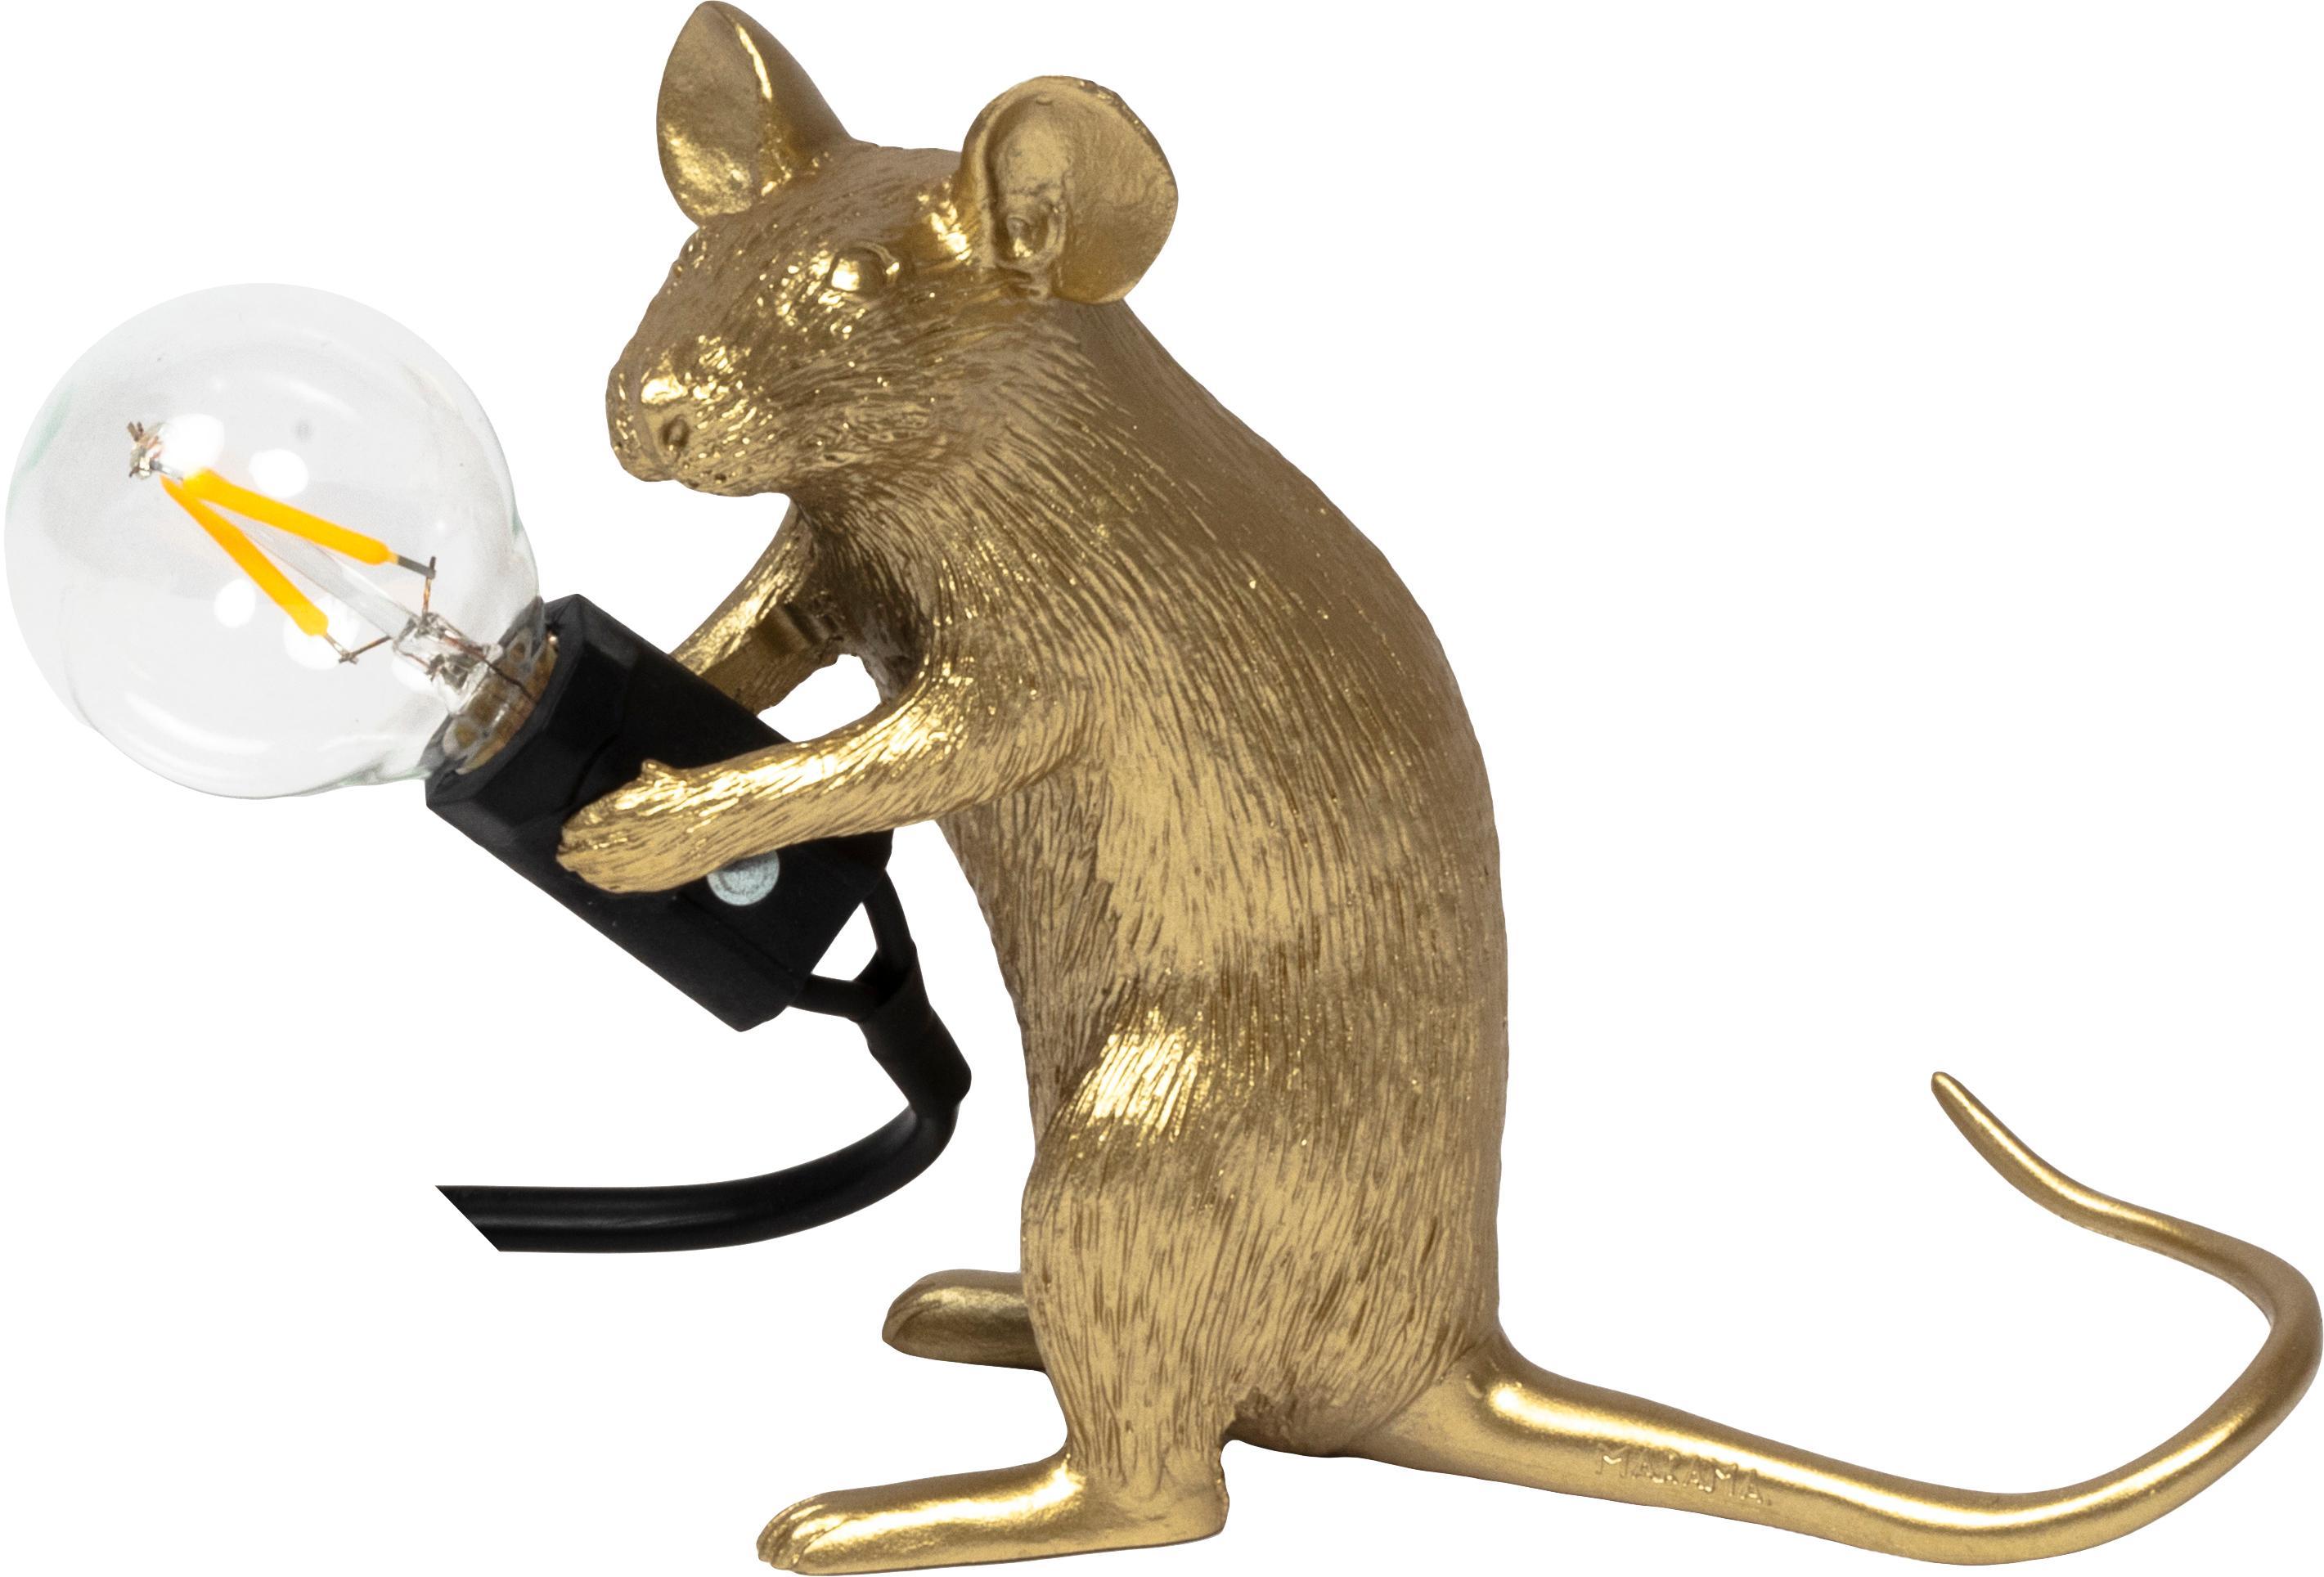 Design-Tischlampe Mouse, Goldfarben, 5 x 13 cm